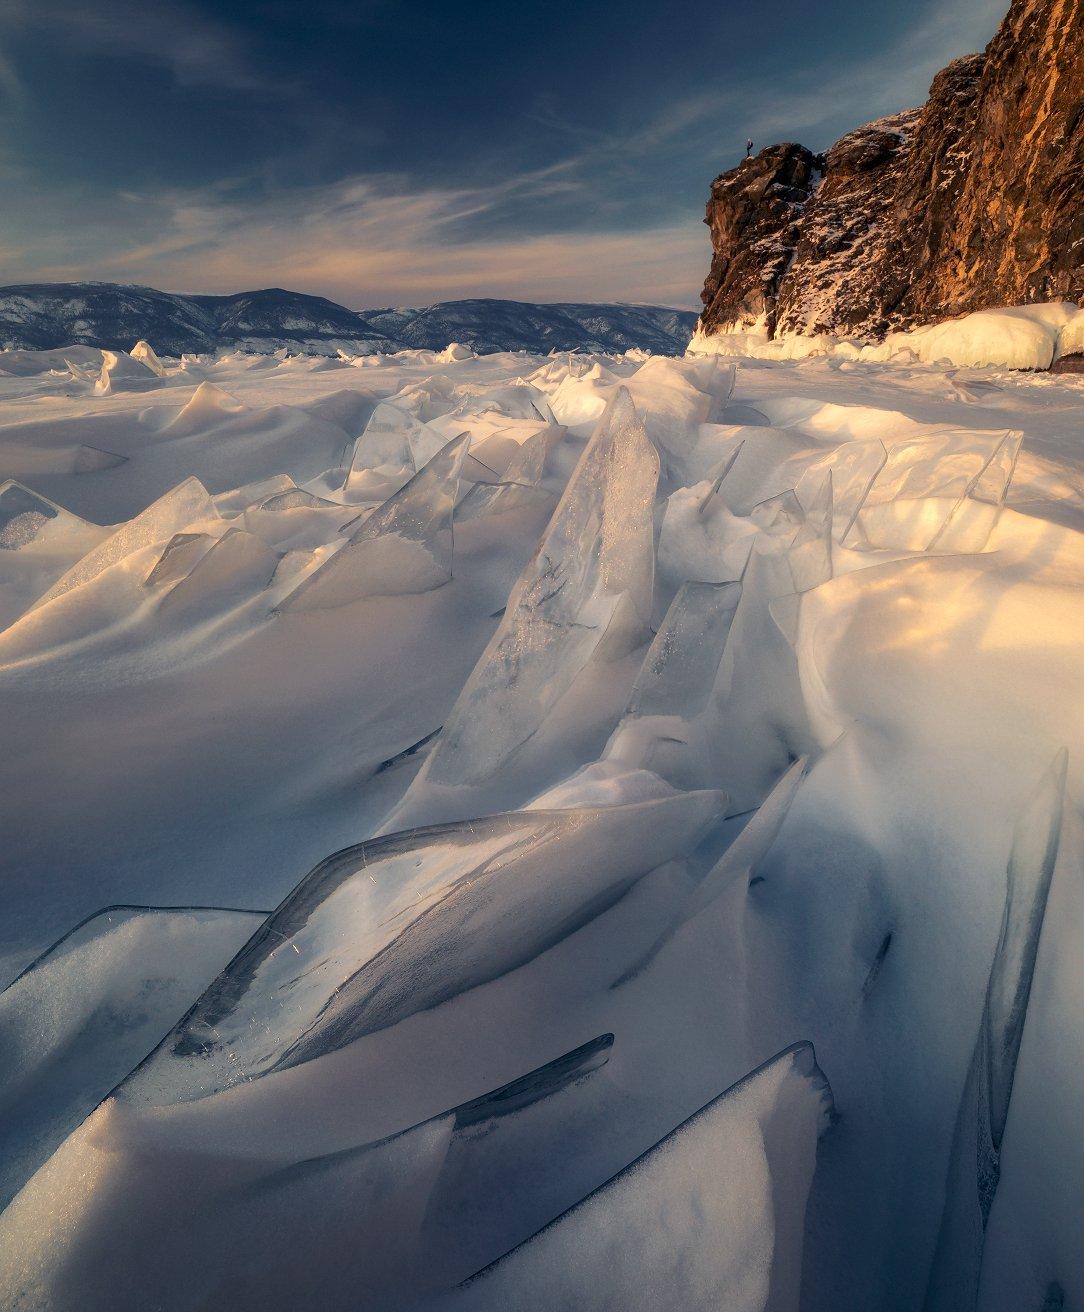 торосы, байкал, зима, пейзаж, природа, лед, baikal, Сергей Луканкин